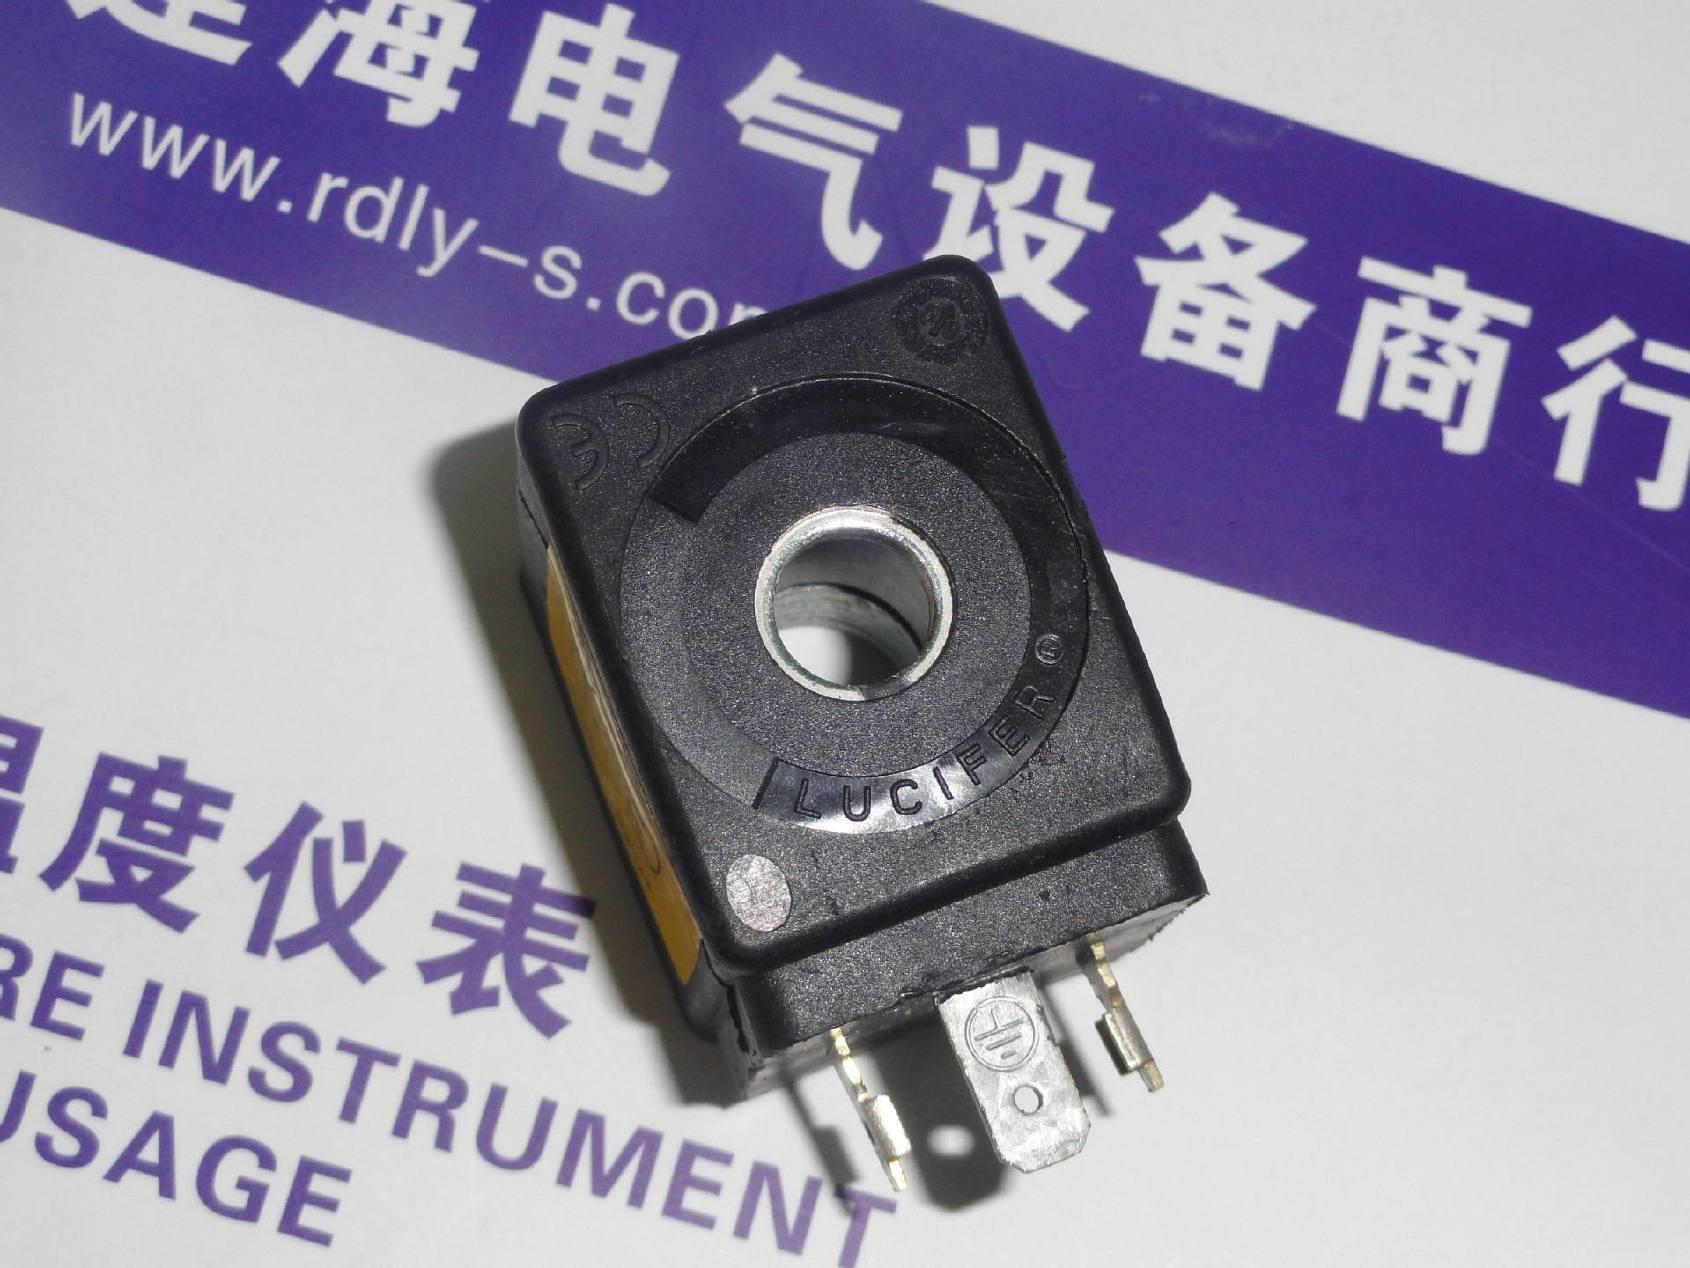 lucifer高频电磁阀阀面盆481865481865cc22dzdz0202cc22parkerparker线圈单冷龙图片